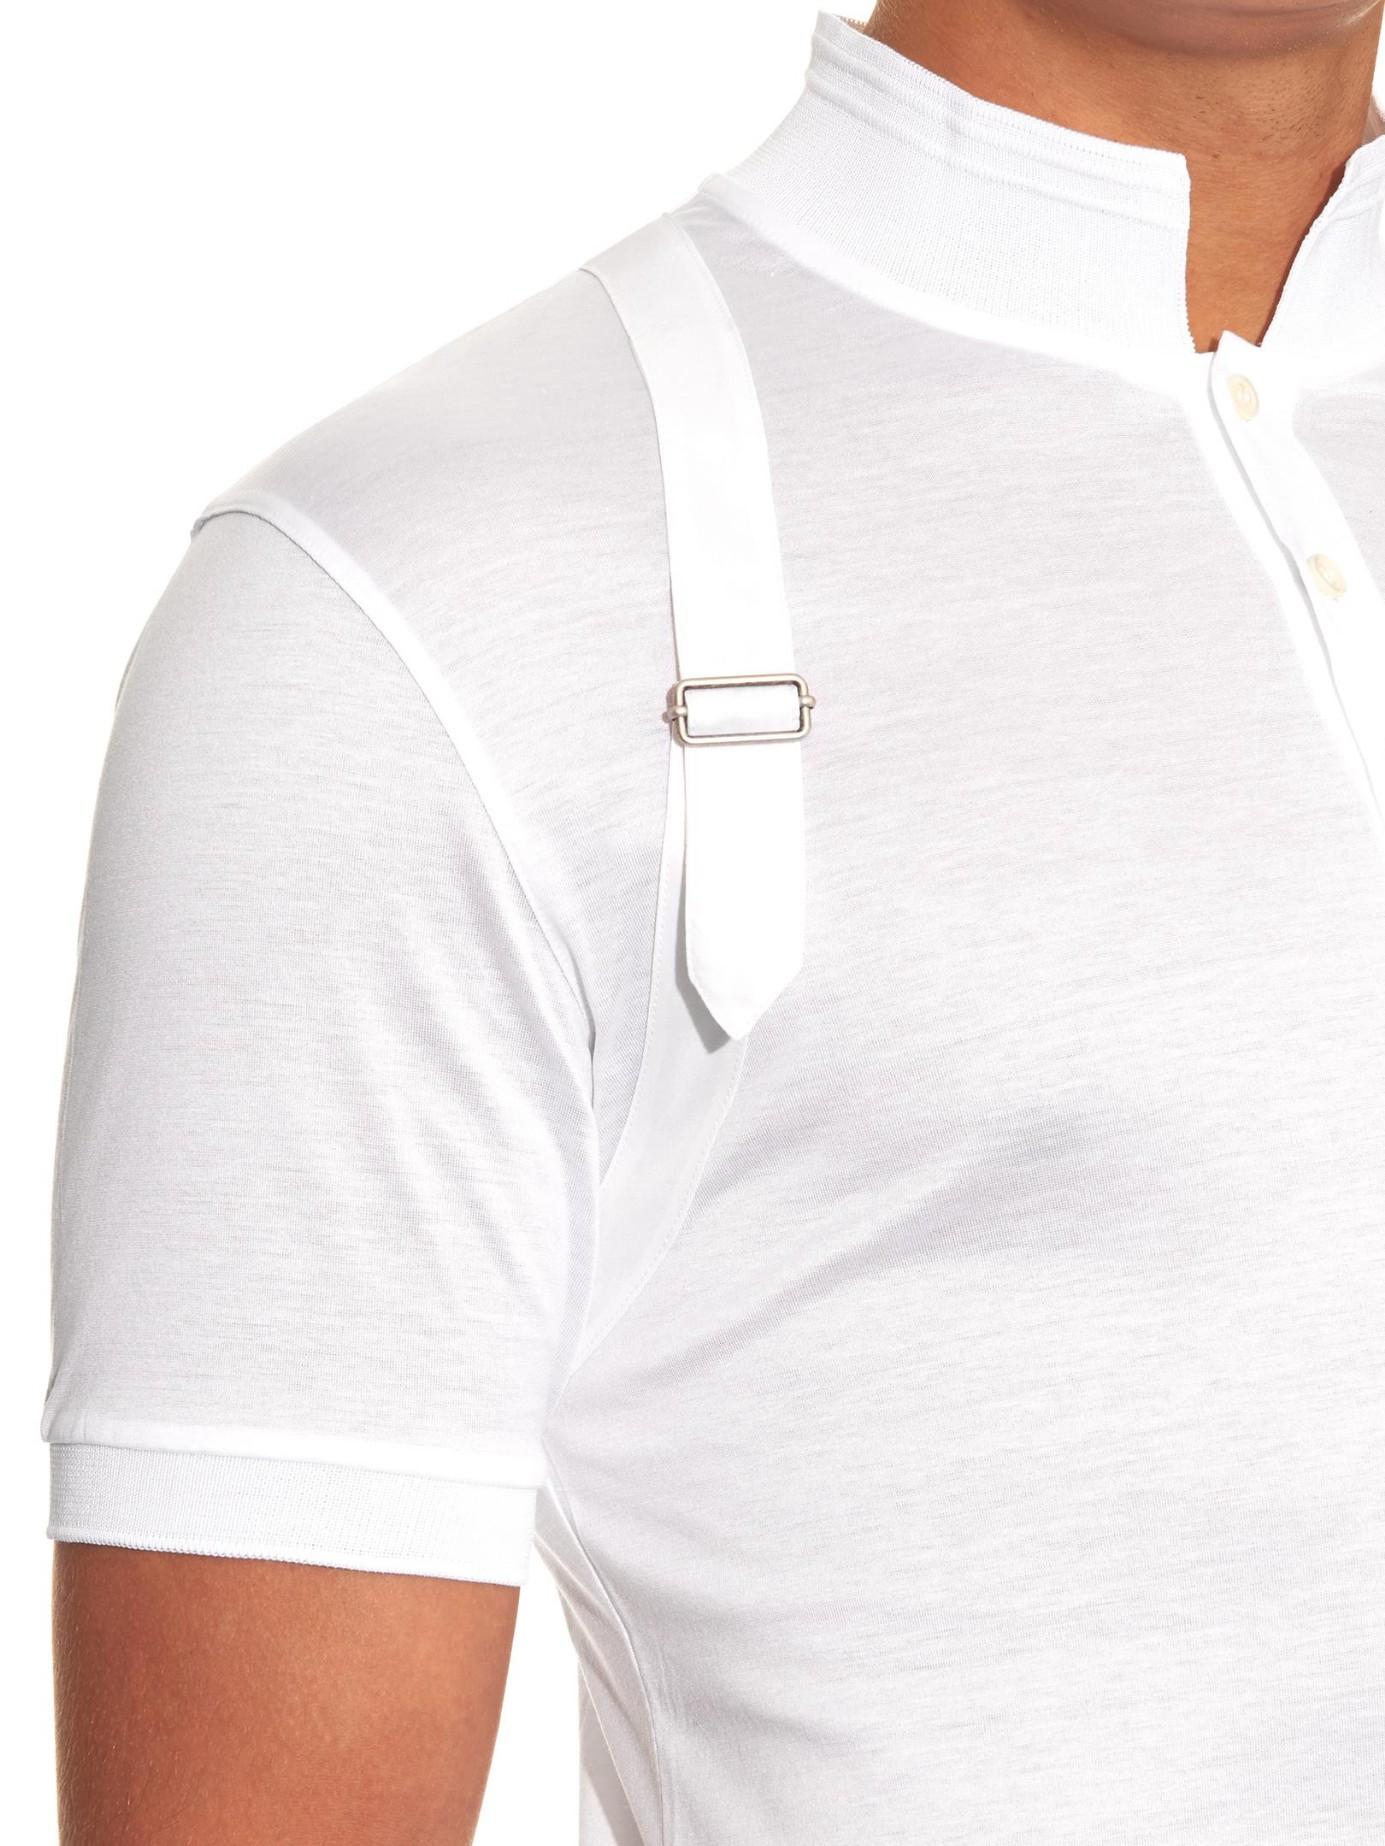 875267cb Shirts harness detail polo shirt--White White